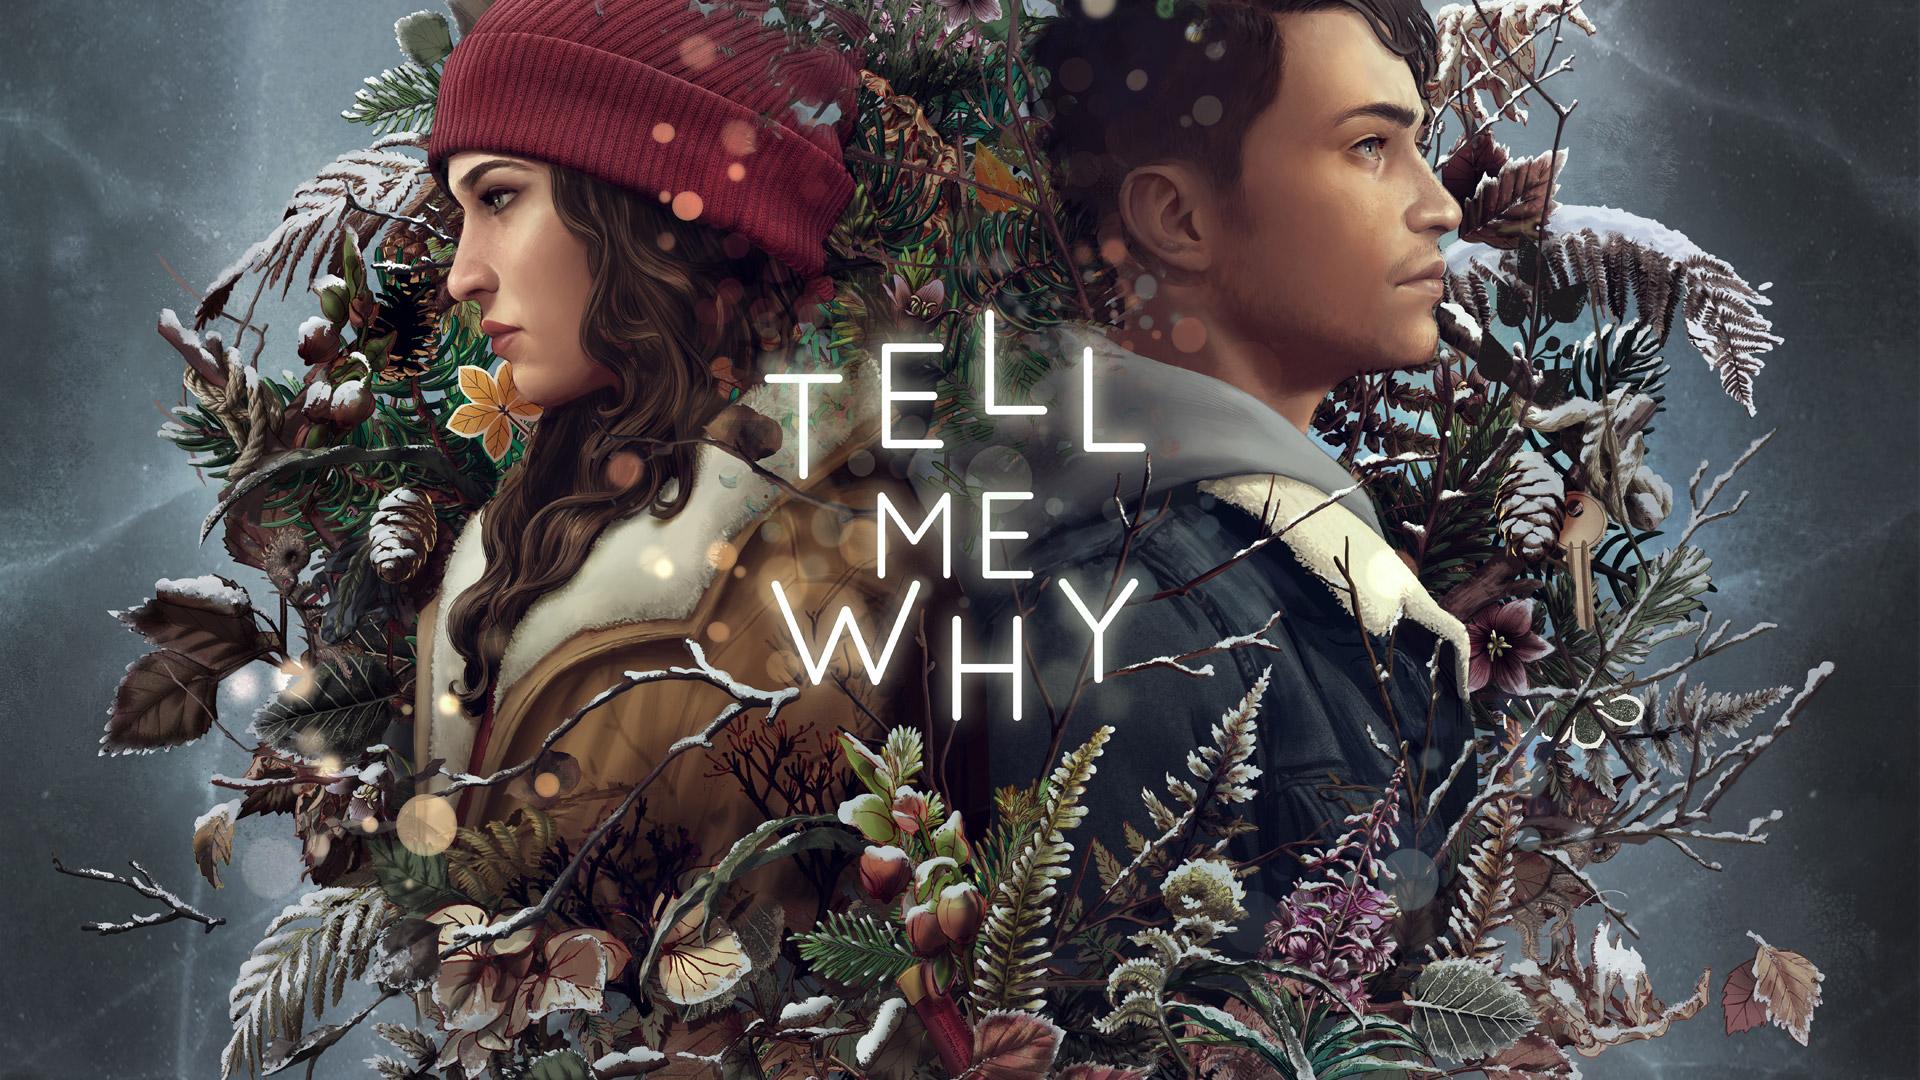 Постер Tell Me Why